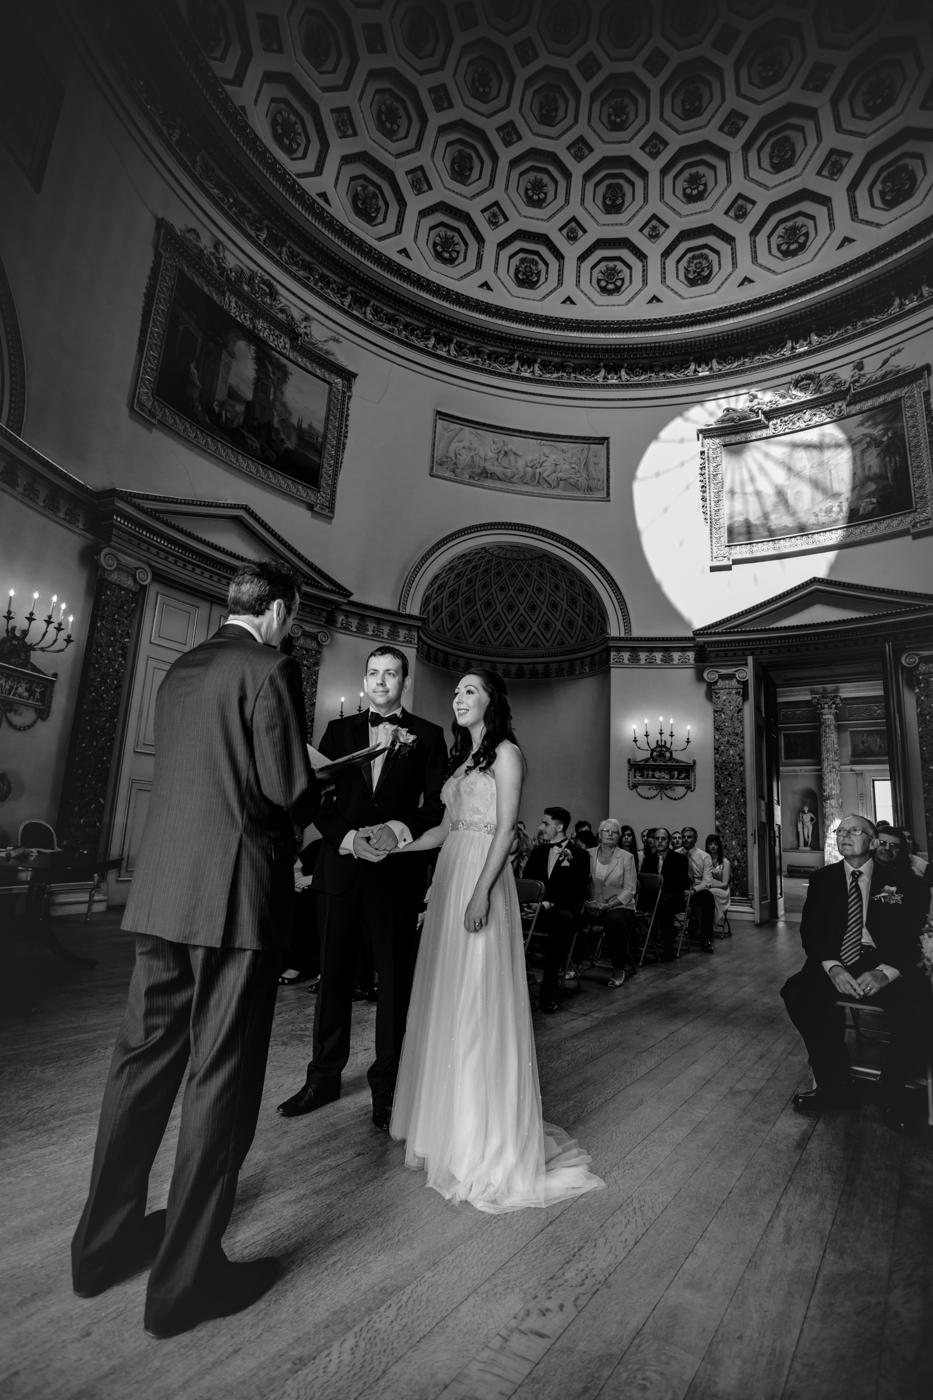 052 - Abi and Chris at Kedleston Hall - Wedding Photography by Mark Pugh www.markpugh.com - 0142.JPG